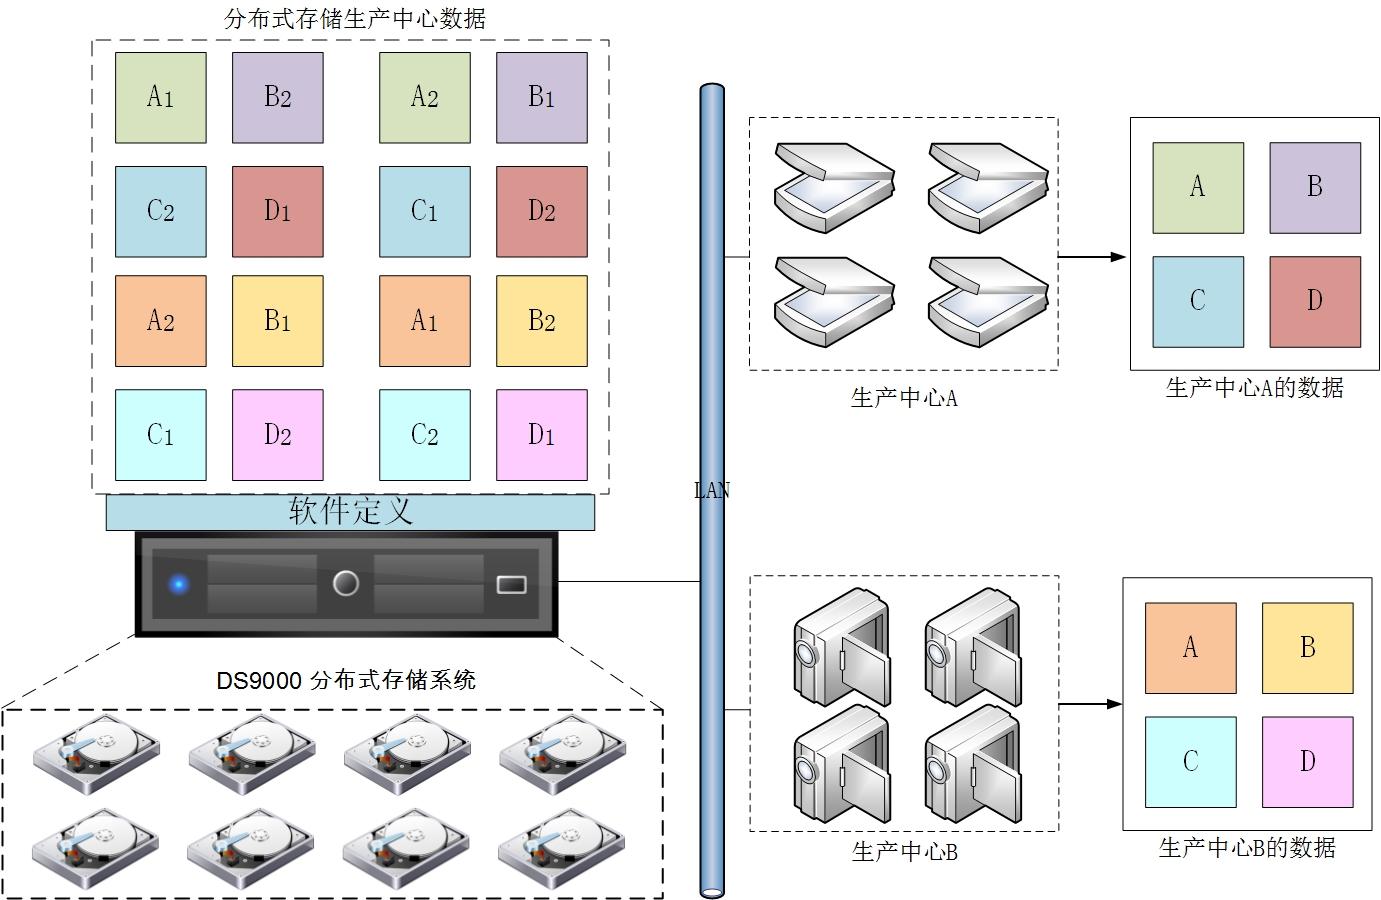 SeaStor DS9000 分布式存储系统